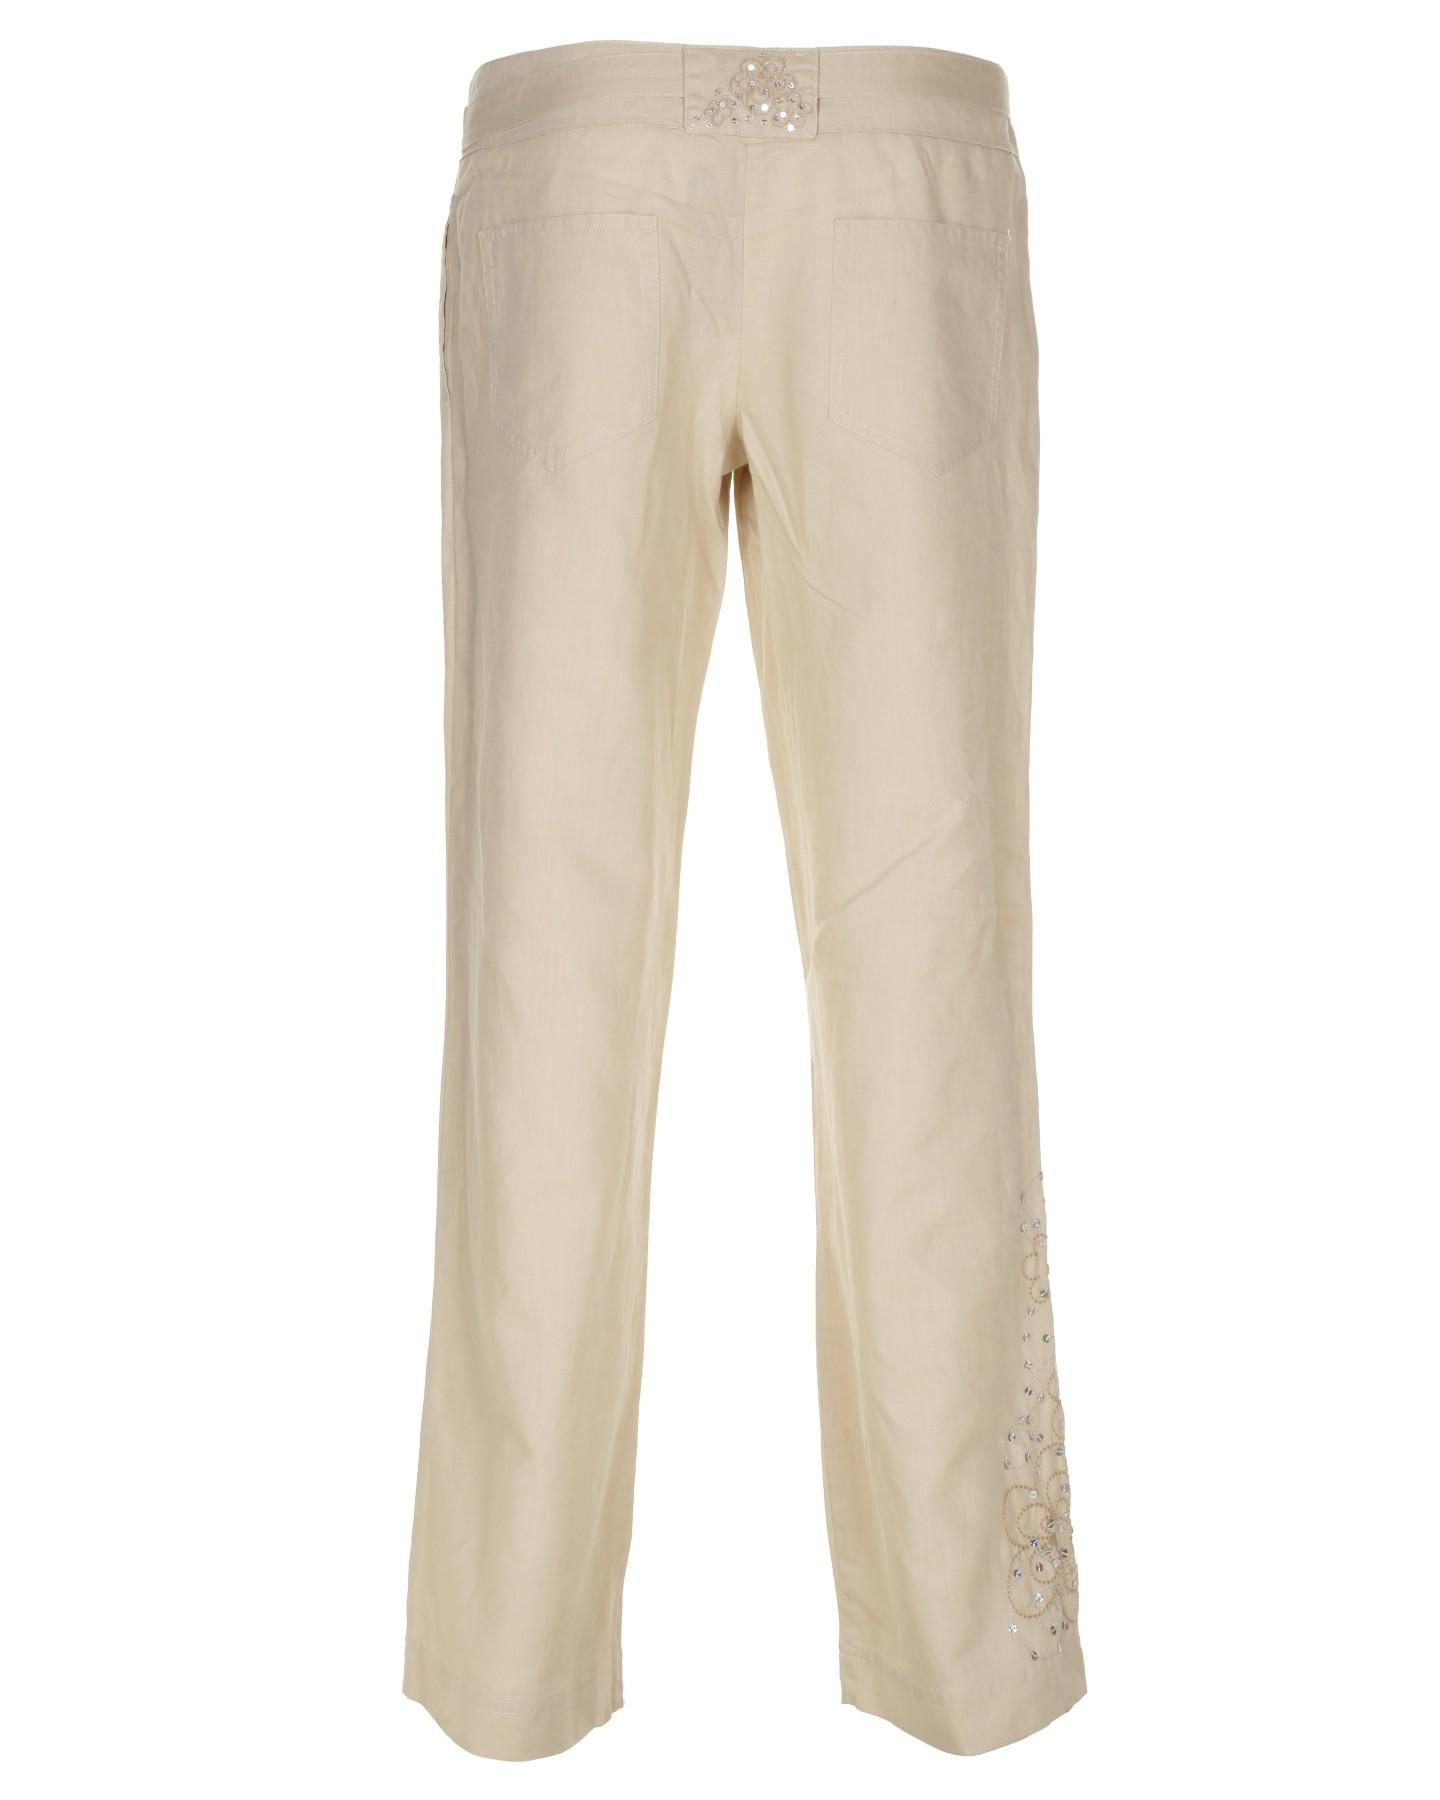 Model Democracy NEW Beige Women39s Size 14 PullOn FoldOver Linen Pants 79